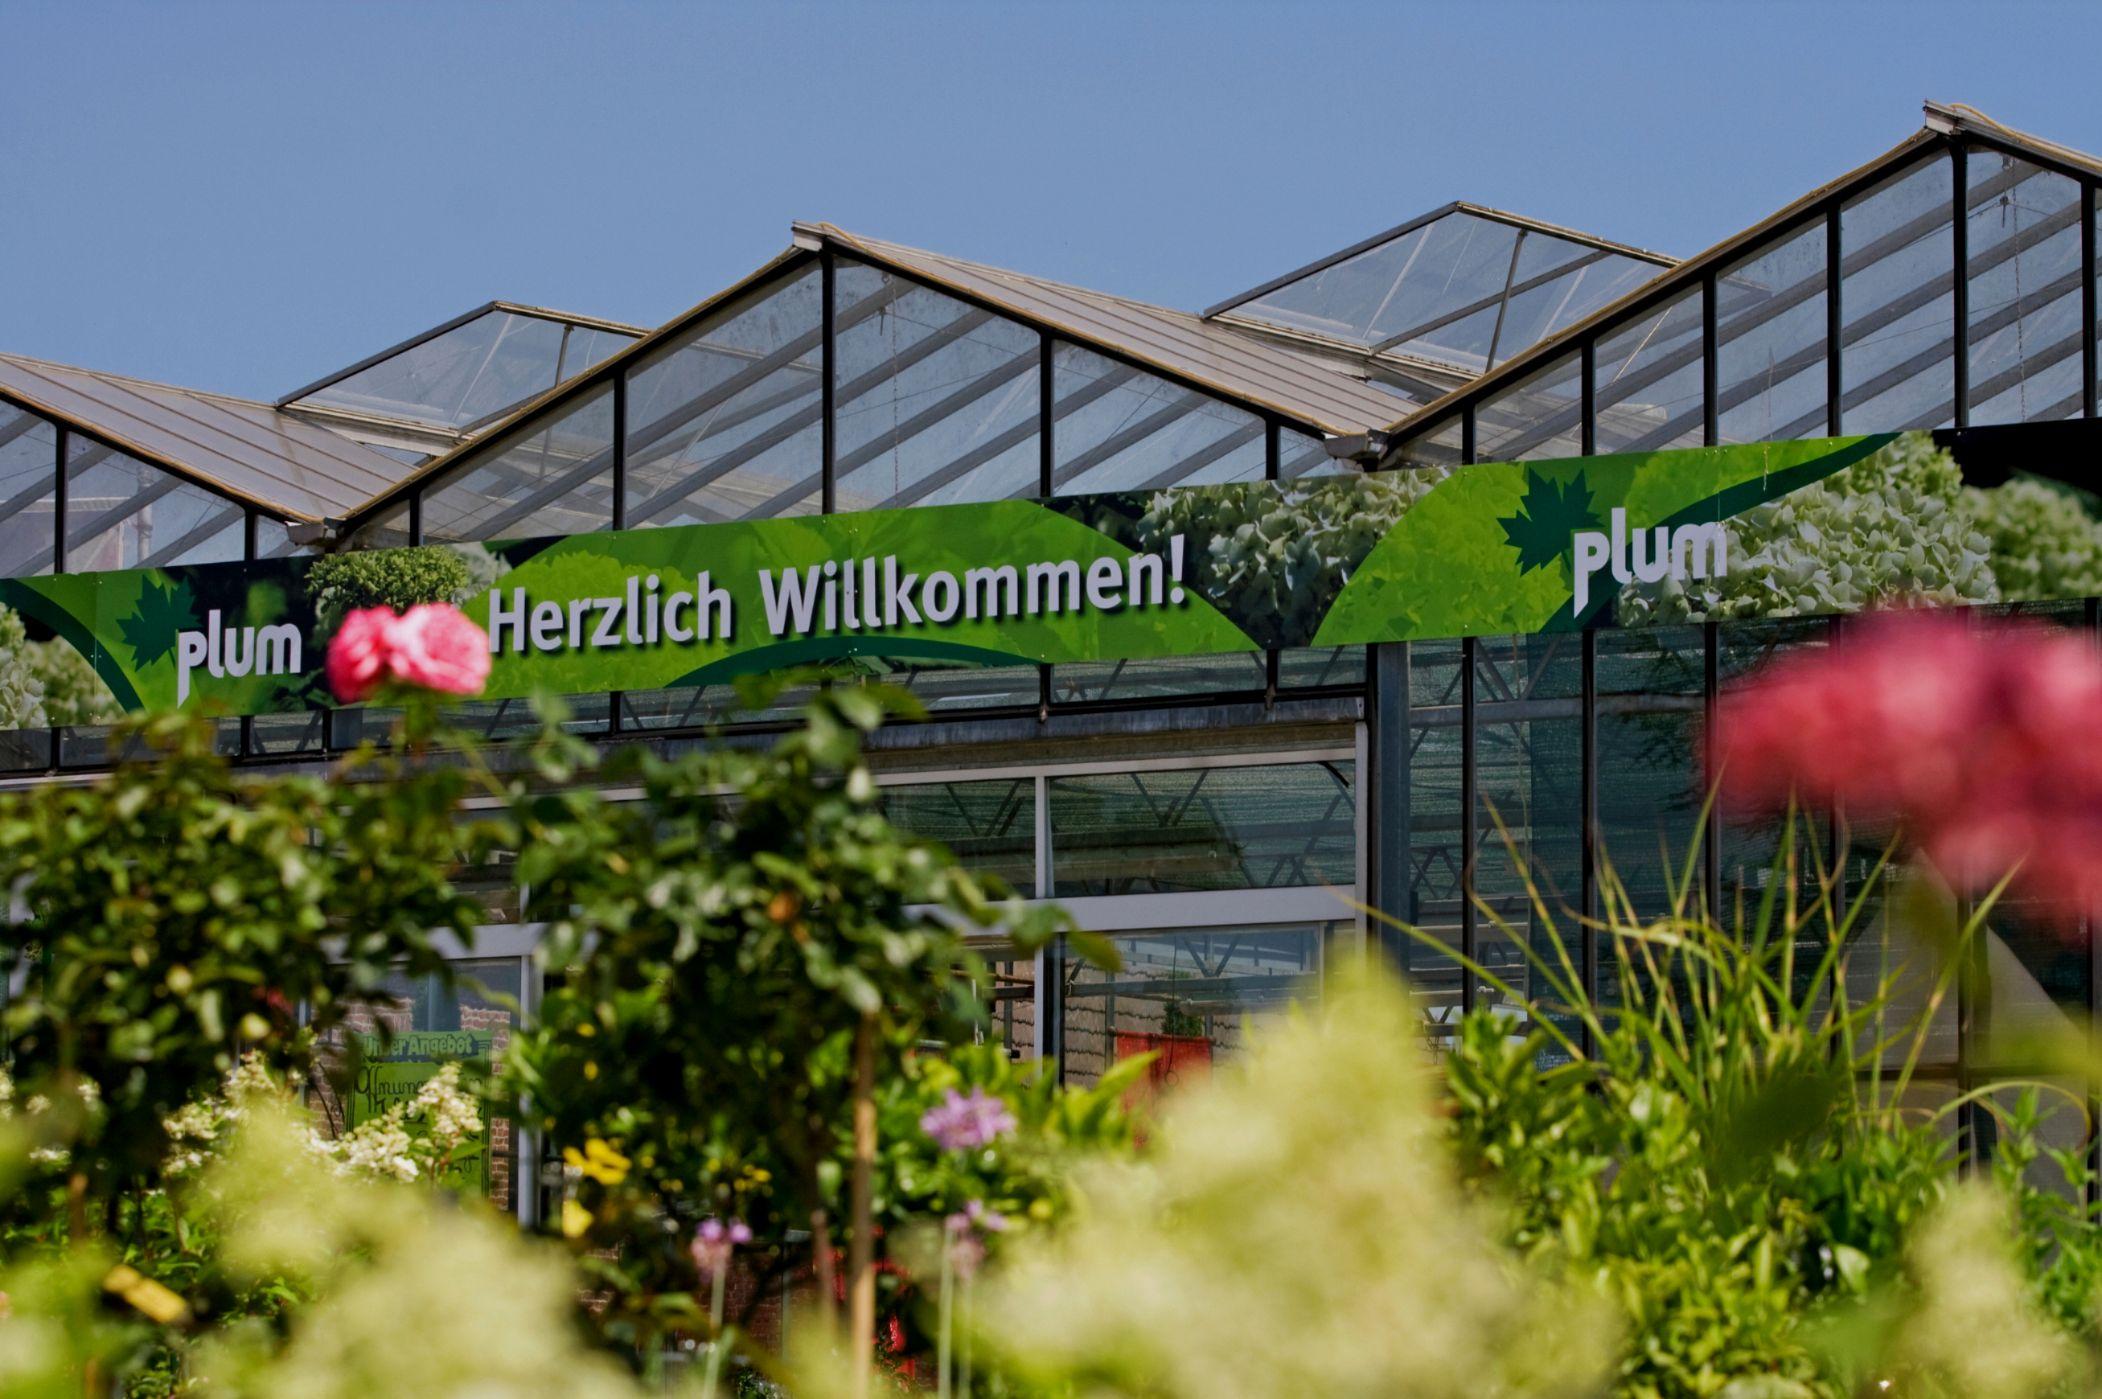 Pflanzenhof Plum